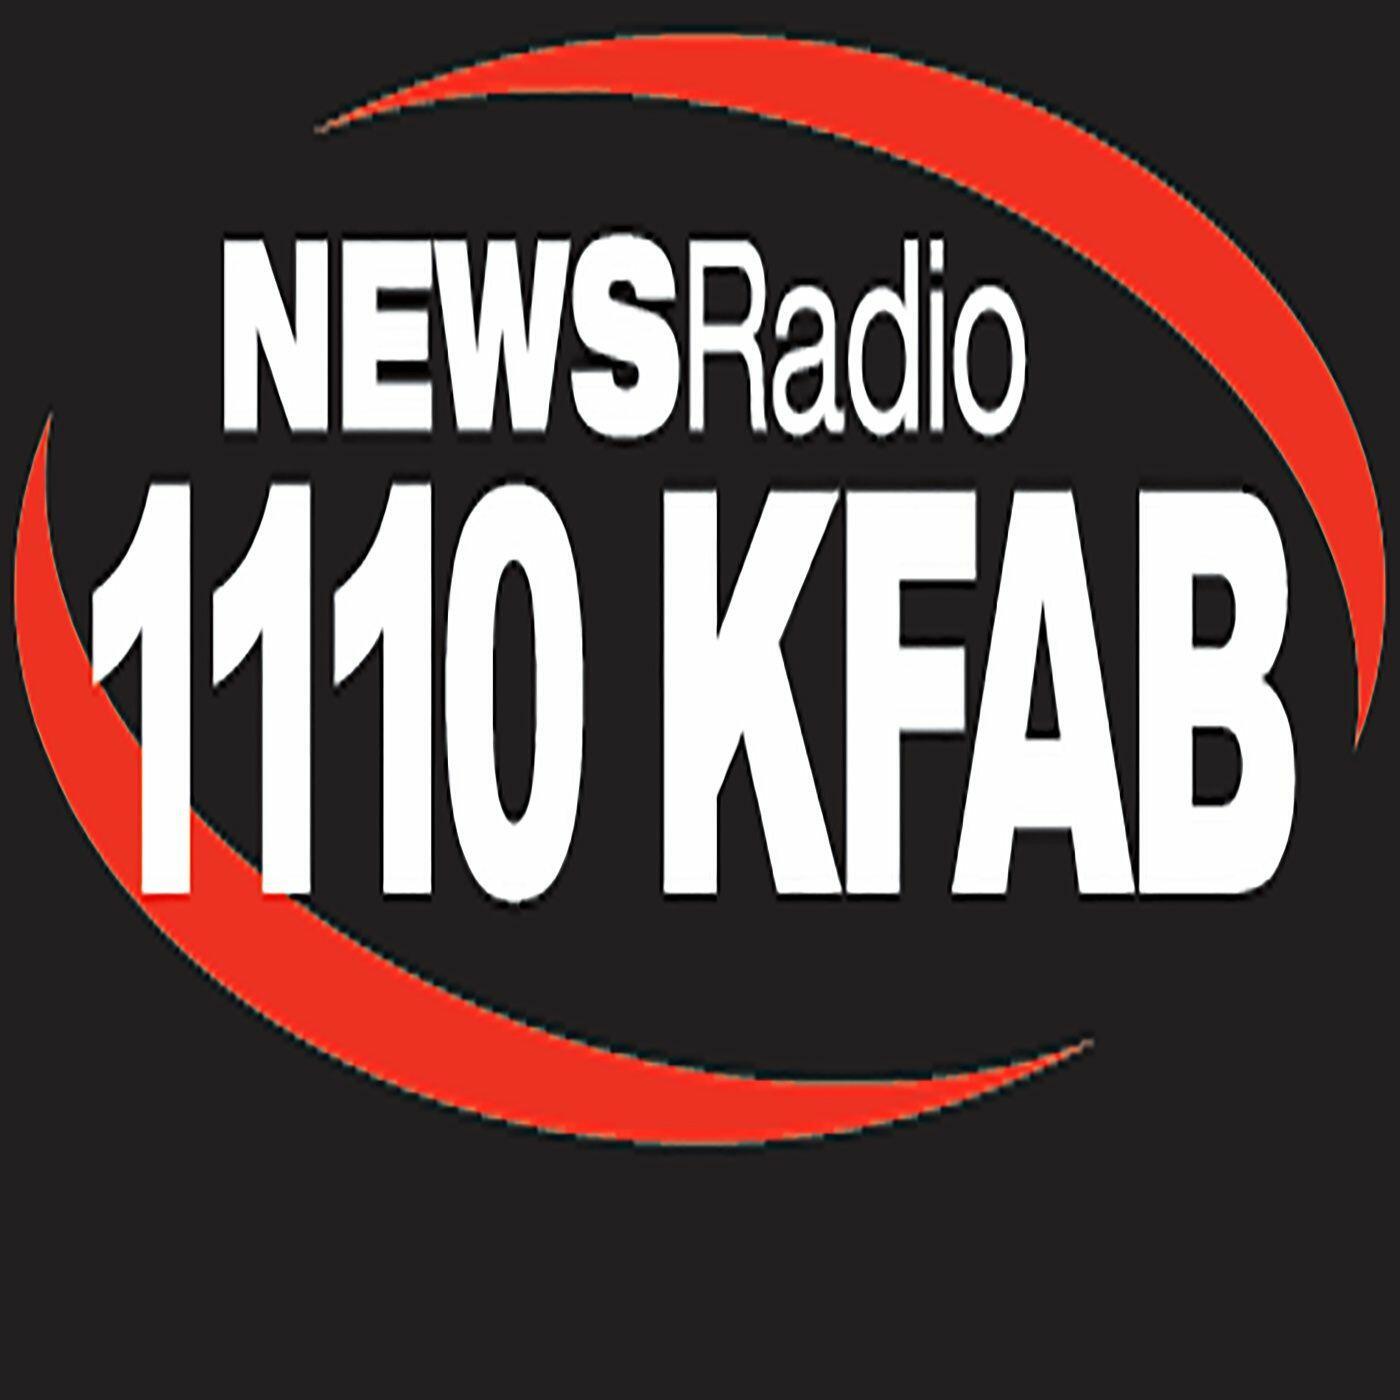 Mr. Mechanic 05-08-2021 - Weekend Shows | iHeartRadio